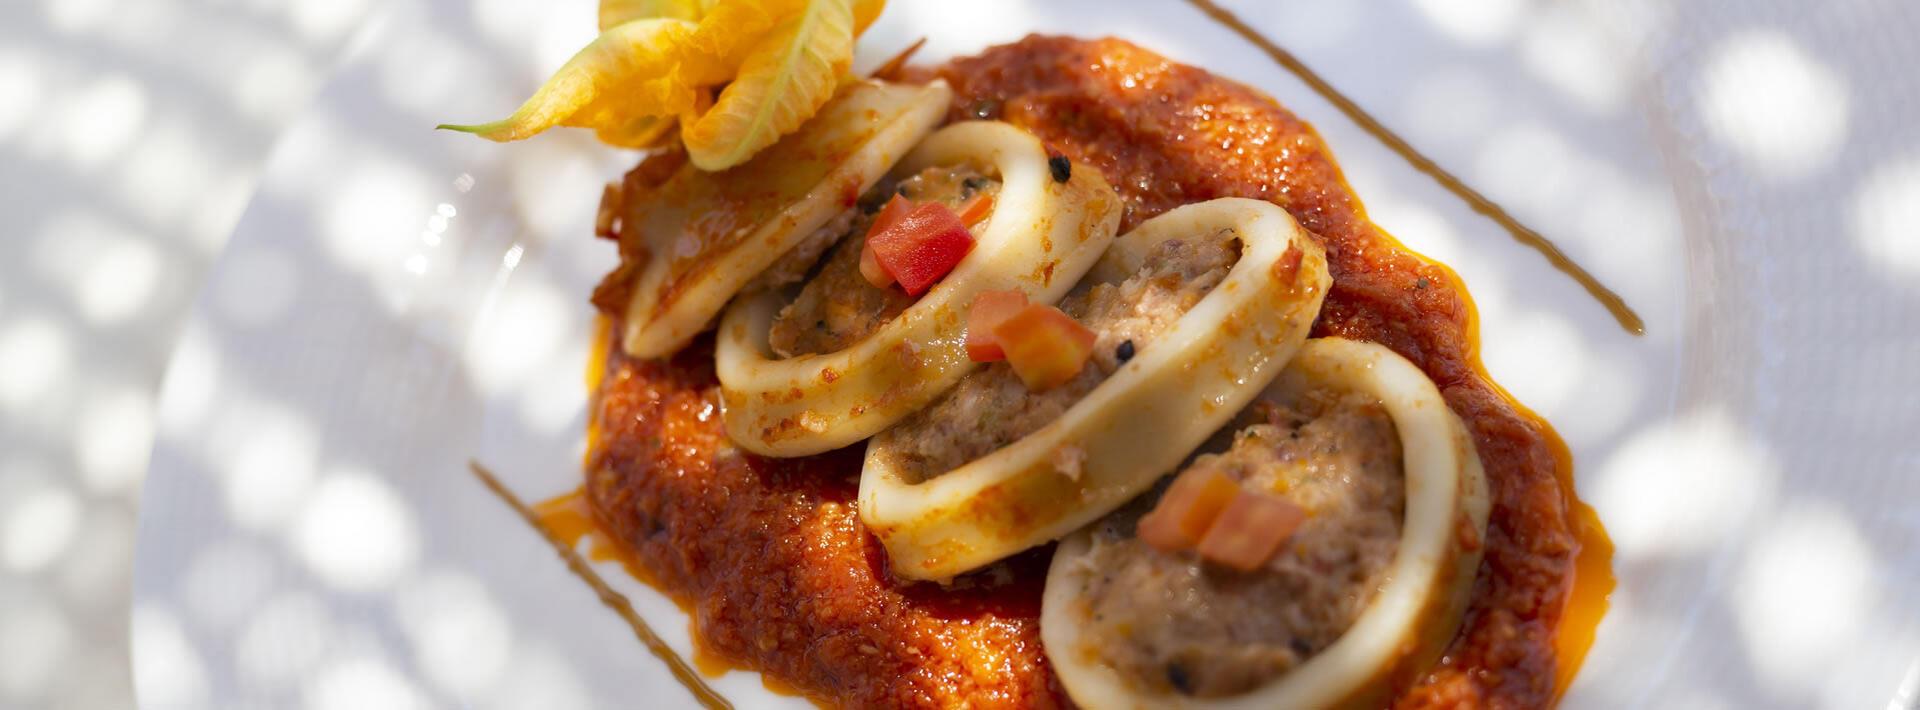 villaggioilgabbiano en seaside-restaurant-capo-vaticano 010